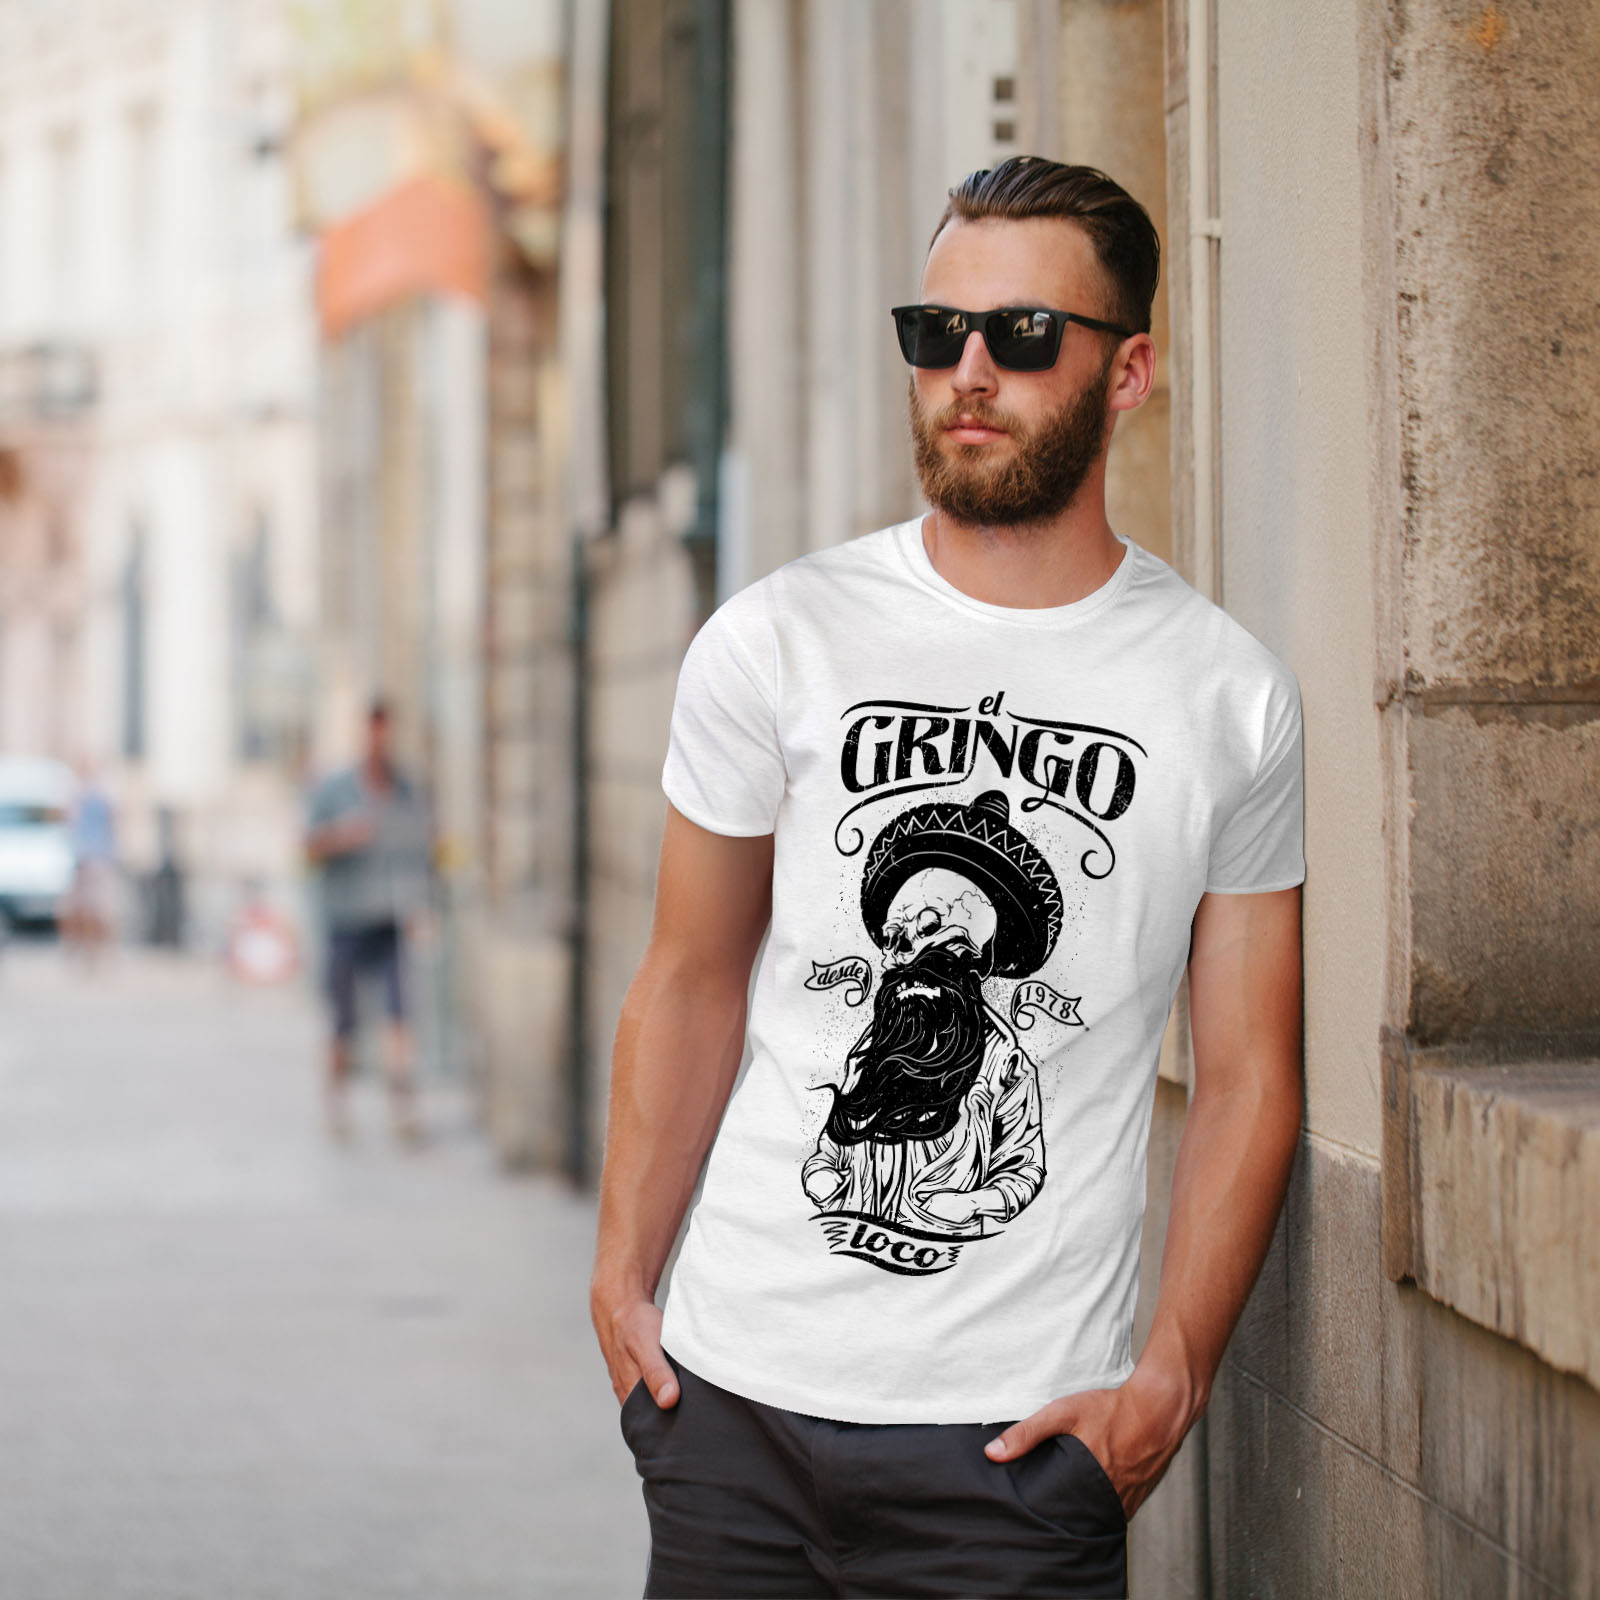 Wellcoda-Gringo-Beard-Skull-Mens-T-shirt-Mexico-Graphic-Design-Printed-Tee thumbnail 11